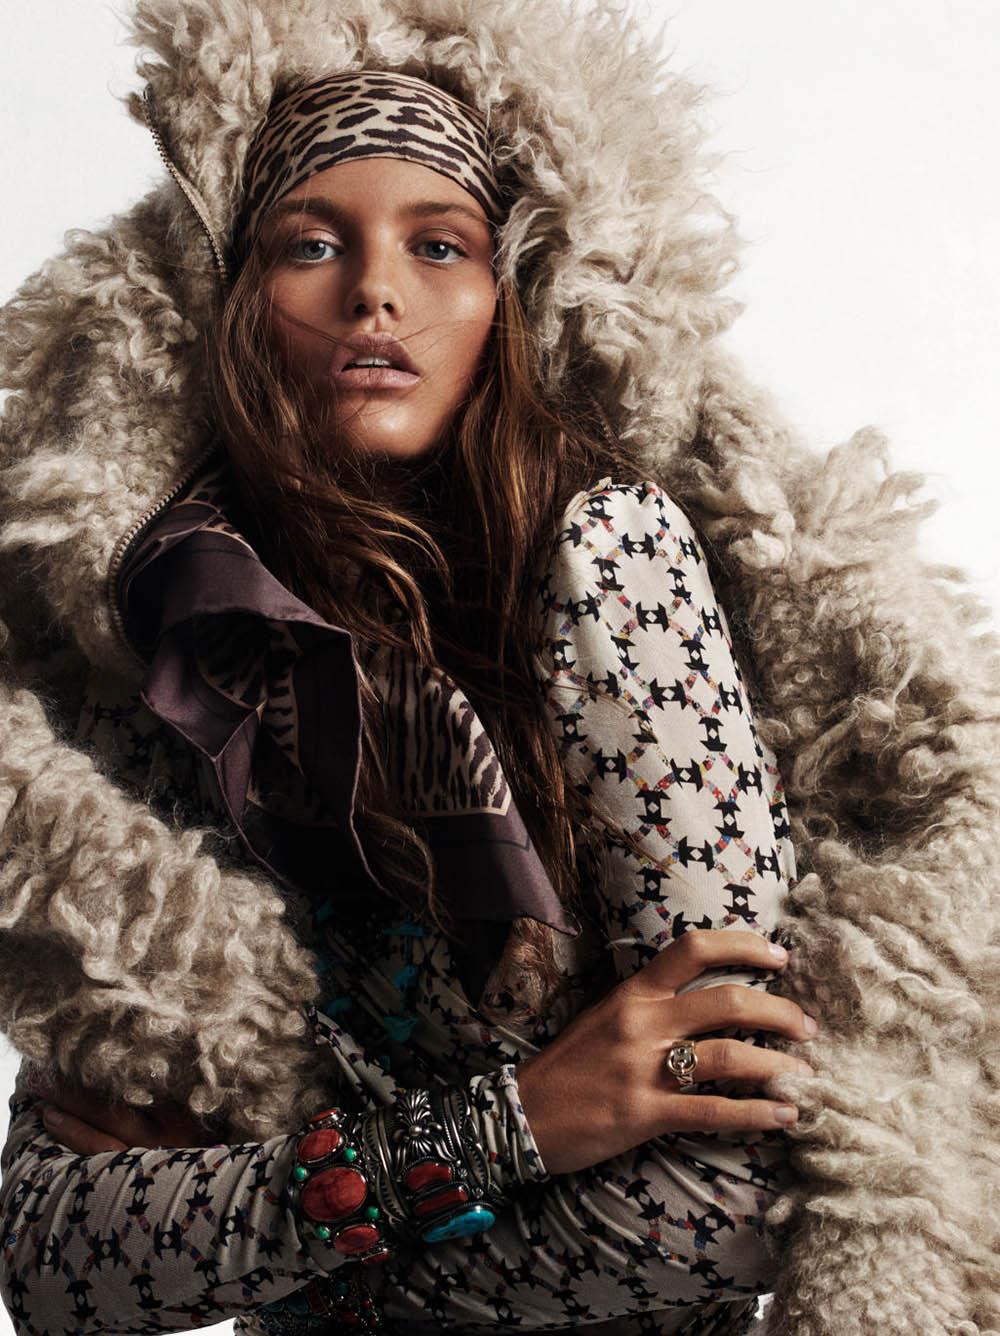 Luna Bijl by Christian MacDonald for Vogue Paris October 2019